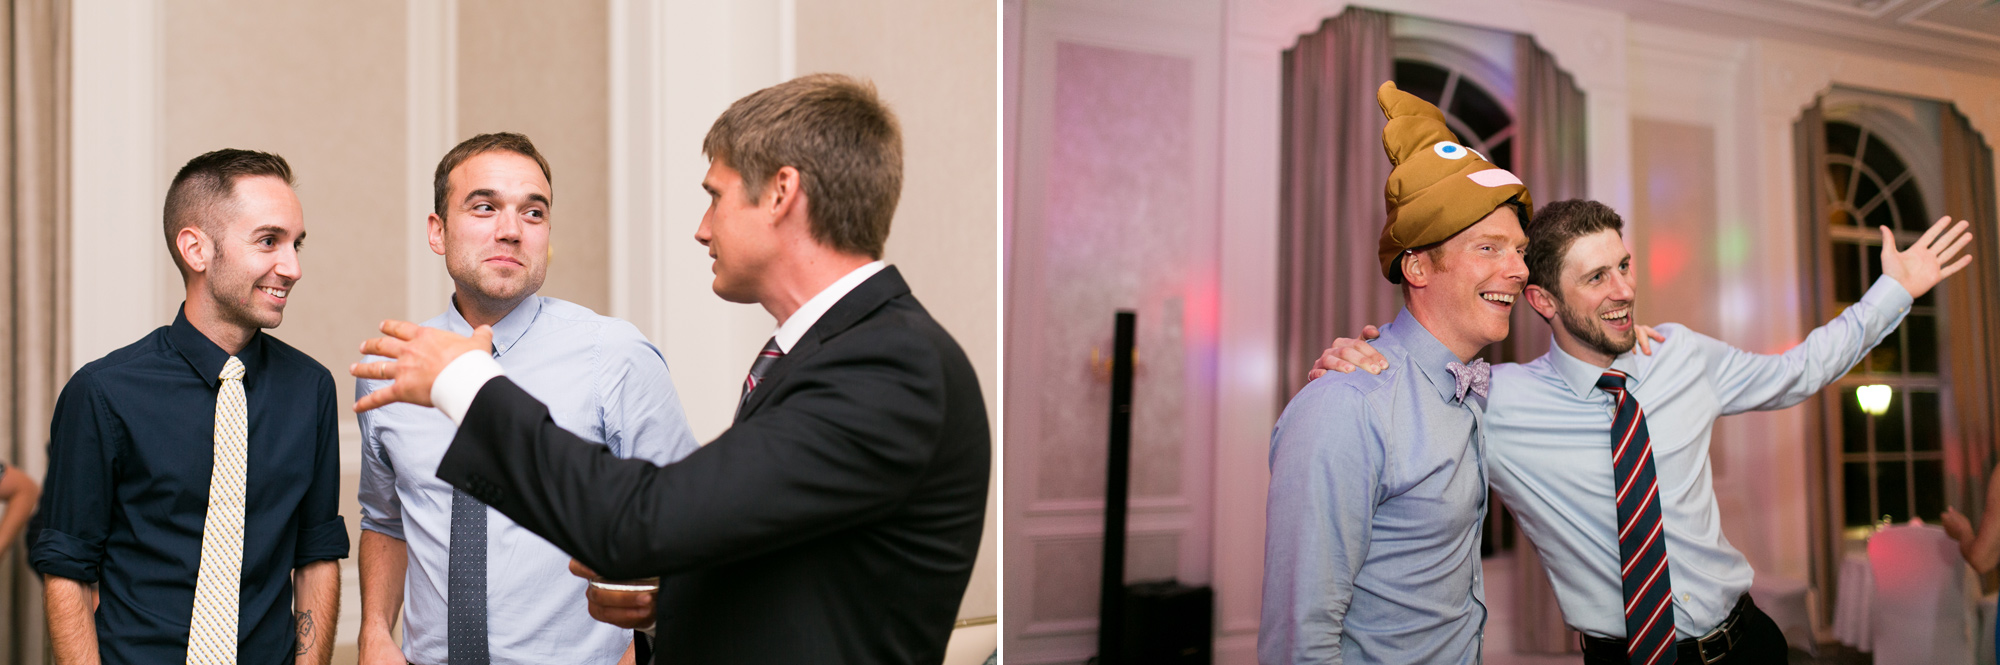 140-lord-nelson-wedding------.jpg